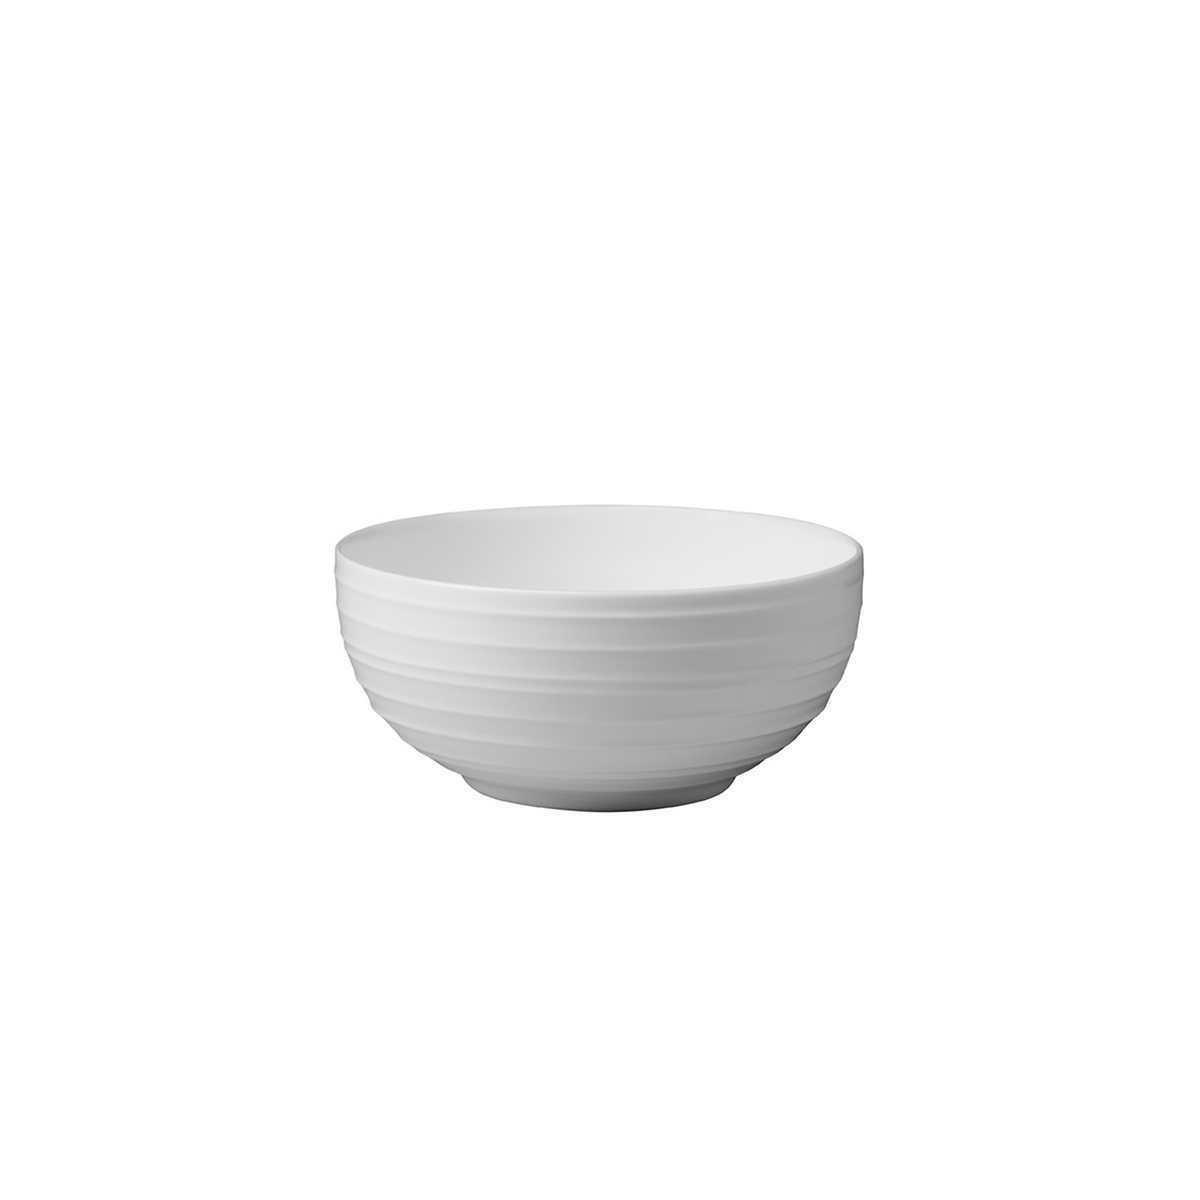 Mikasa Dinnerware Bone China Services Bowls